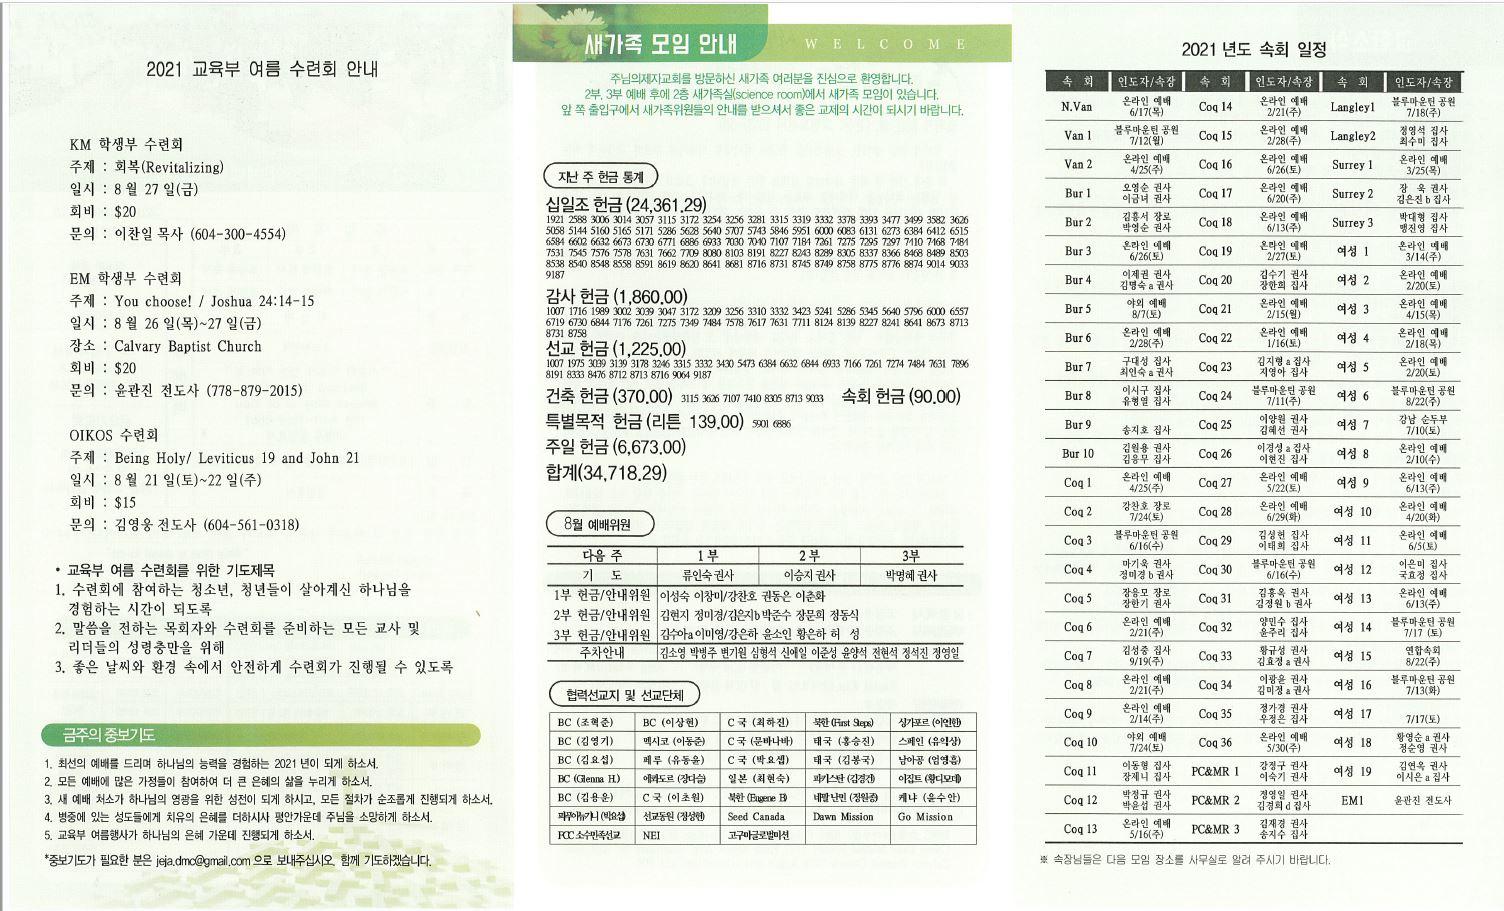 mb-file.php?path=2021%2F08%2F06%2FF2583_Capture-1.JPG